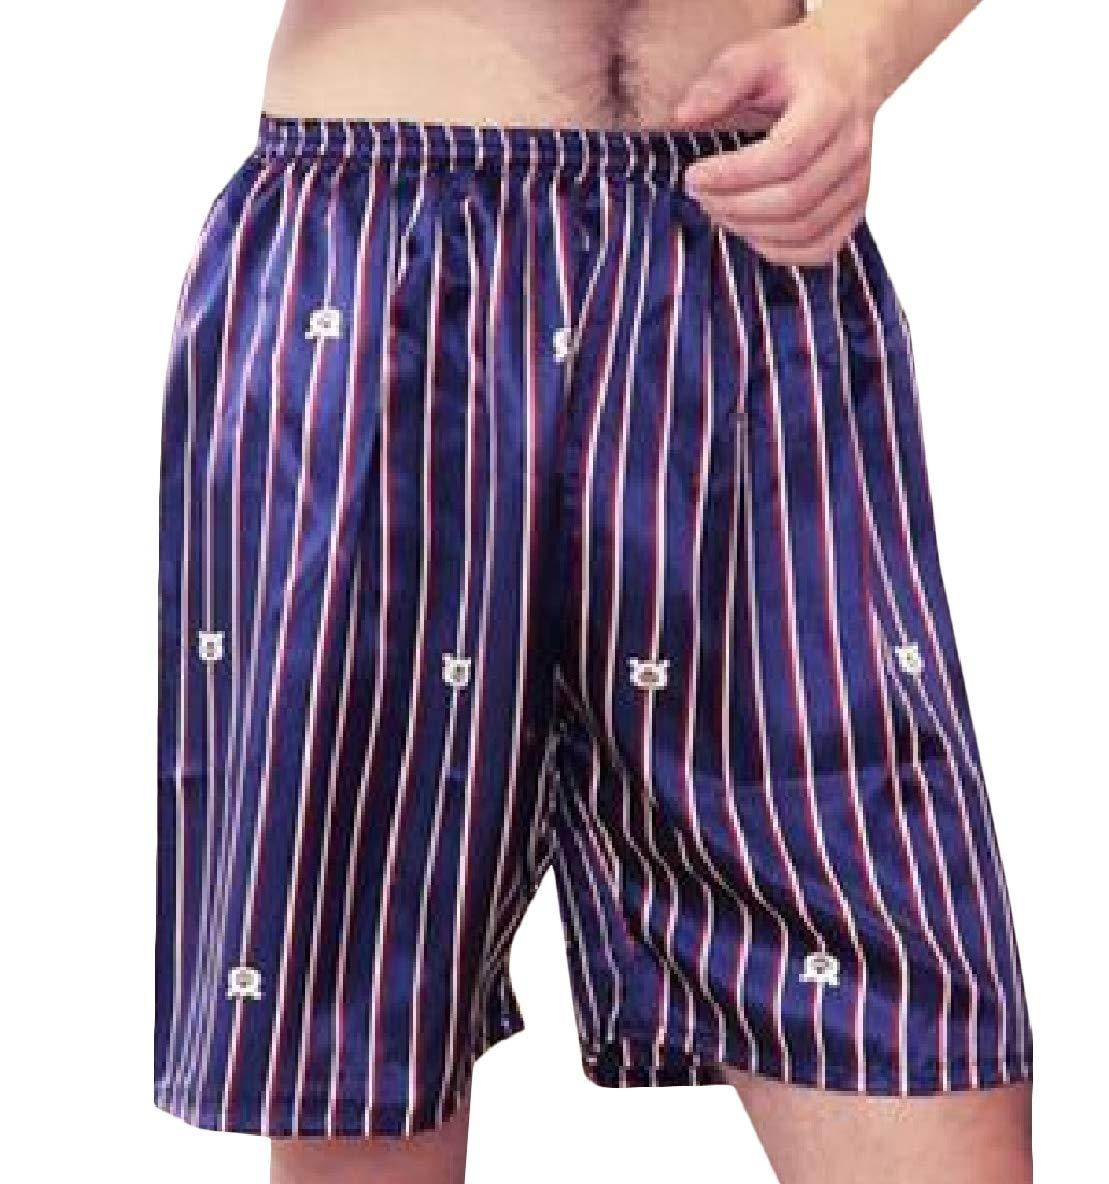 Winwinus Mens Comfort Silk Printed Relaxed-Fit Pajama Pants/Lounge Pants? Pattern15 L